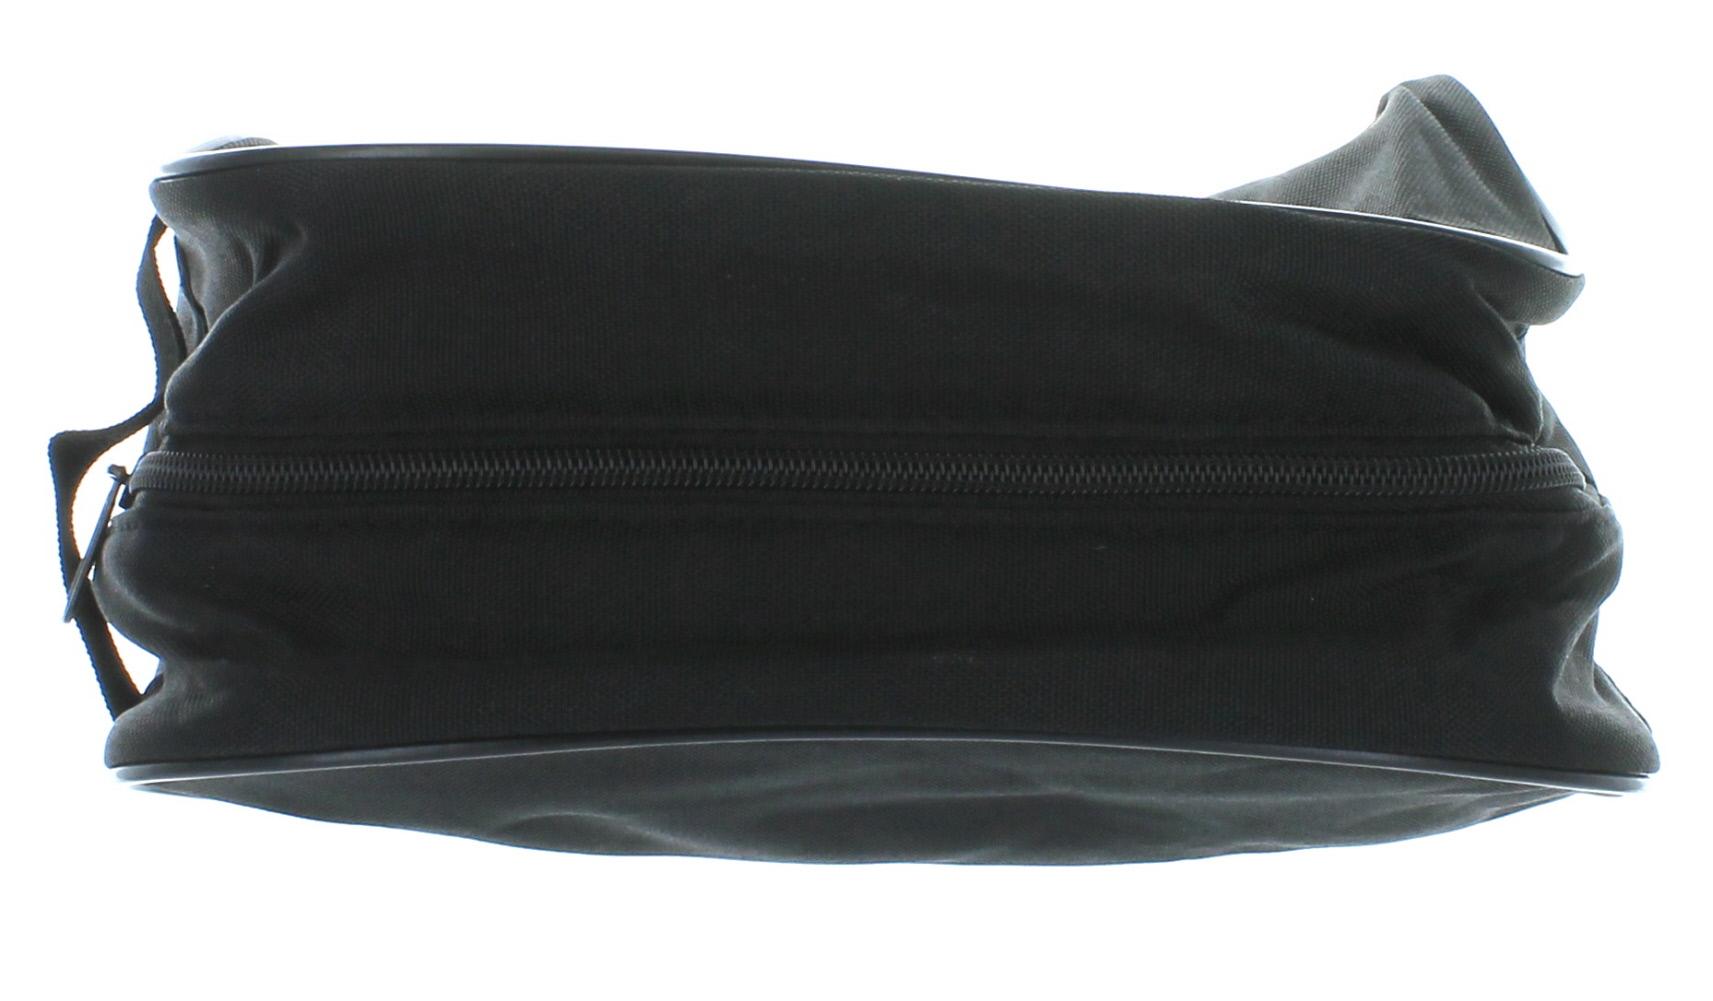 26b1649f5e32 Black Gillette Men s Travel Bag Toiletry Shave Case Bag Dopp Kit - Walmart .com